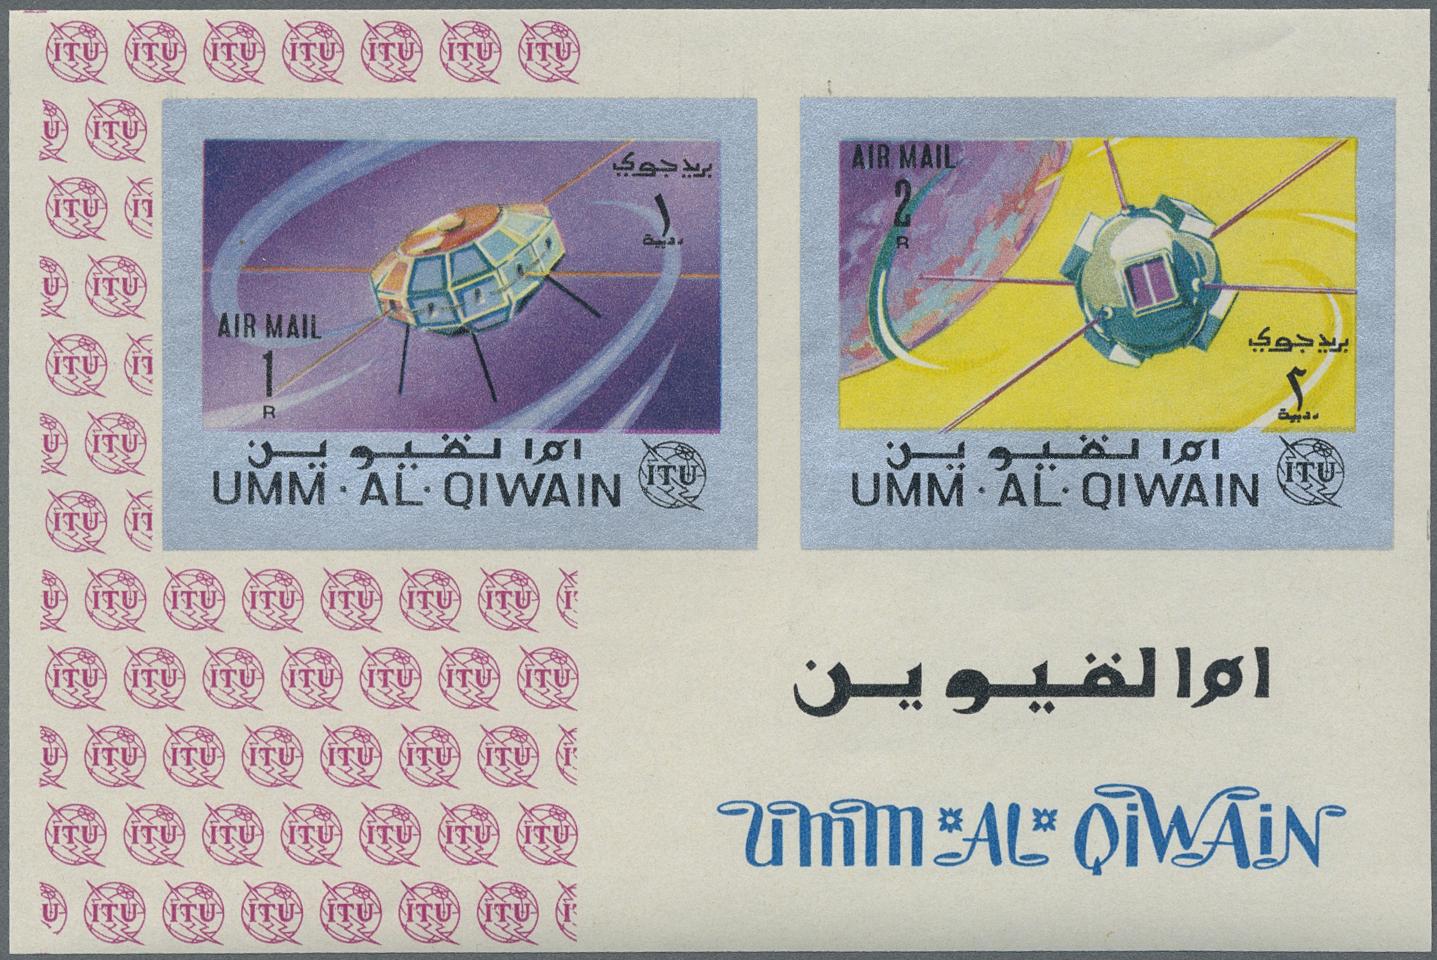 Lot 20126 - Umm al Qaiwain  -  Auktionshaus Christoph Gärtner GmbH & Co. KG Sale #47 Collections: Overseas, Thematics, Europe